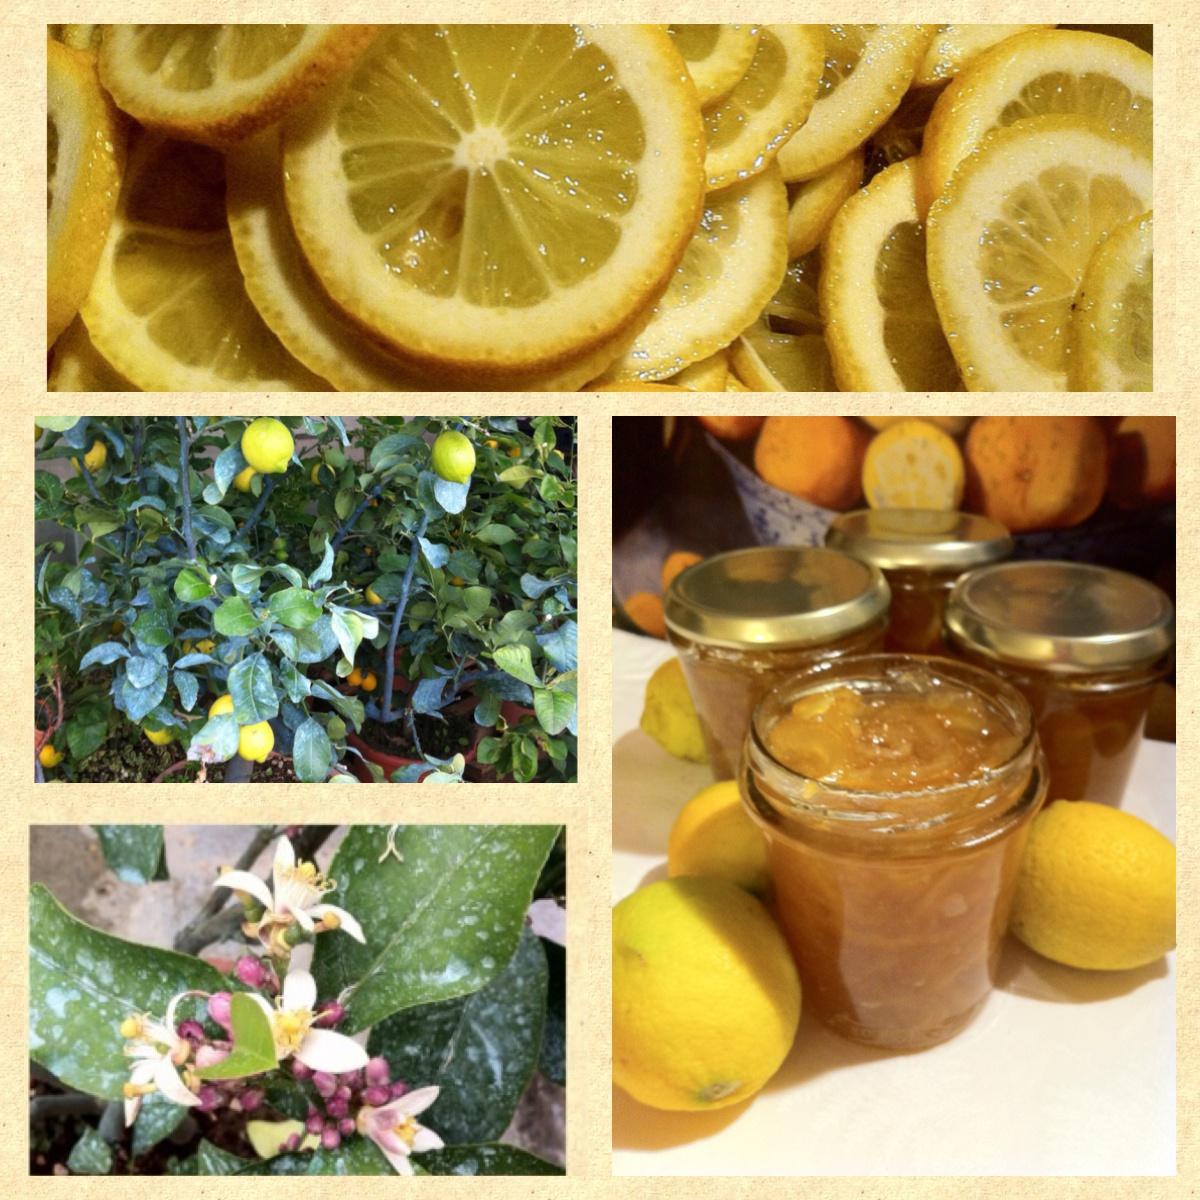 marmellata-di-limoni-a-fette-5.JPG